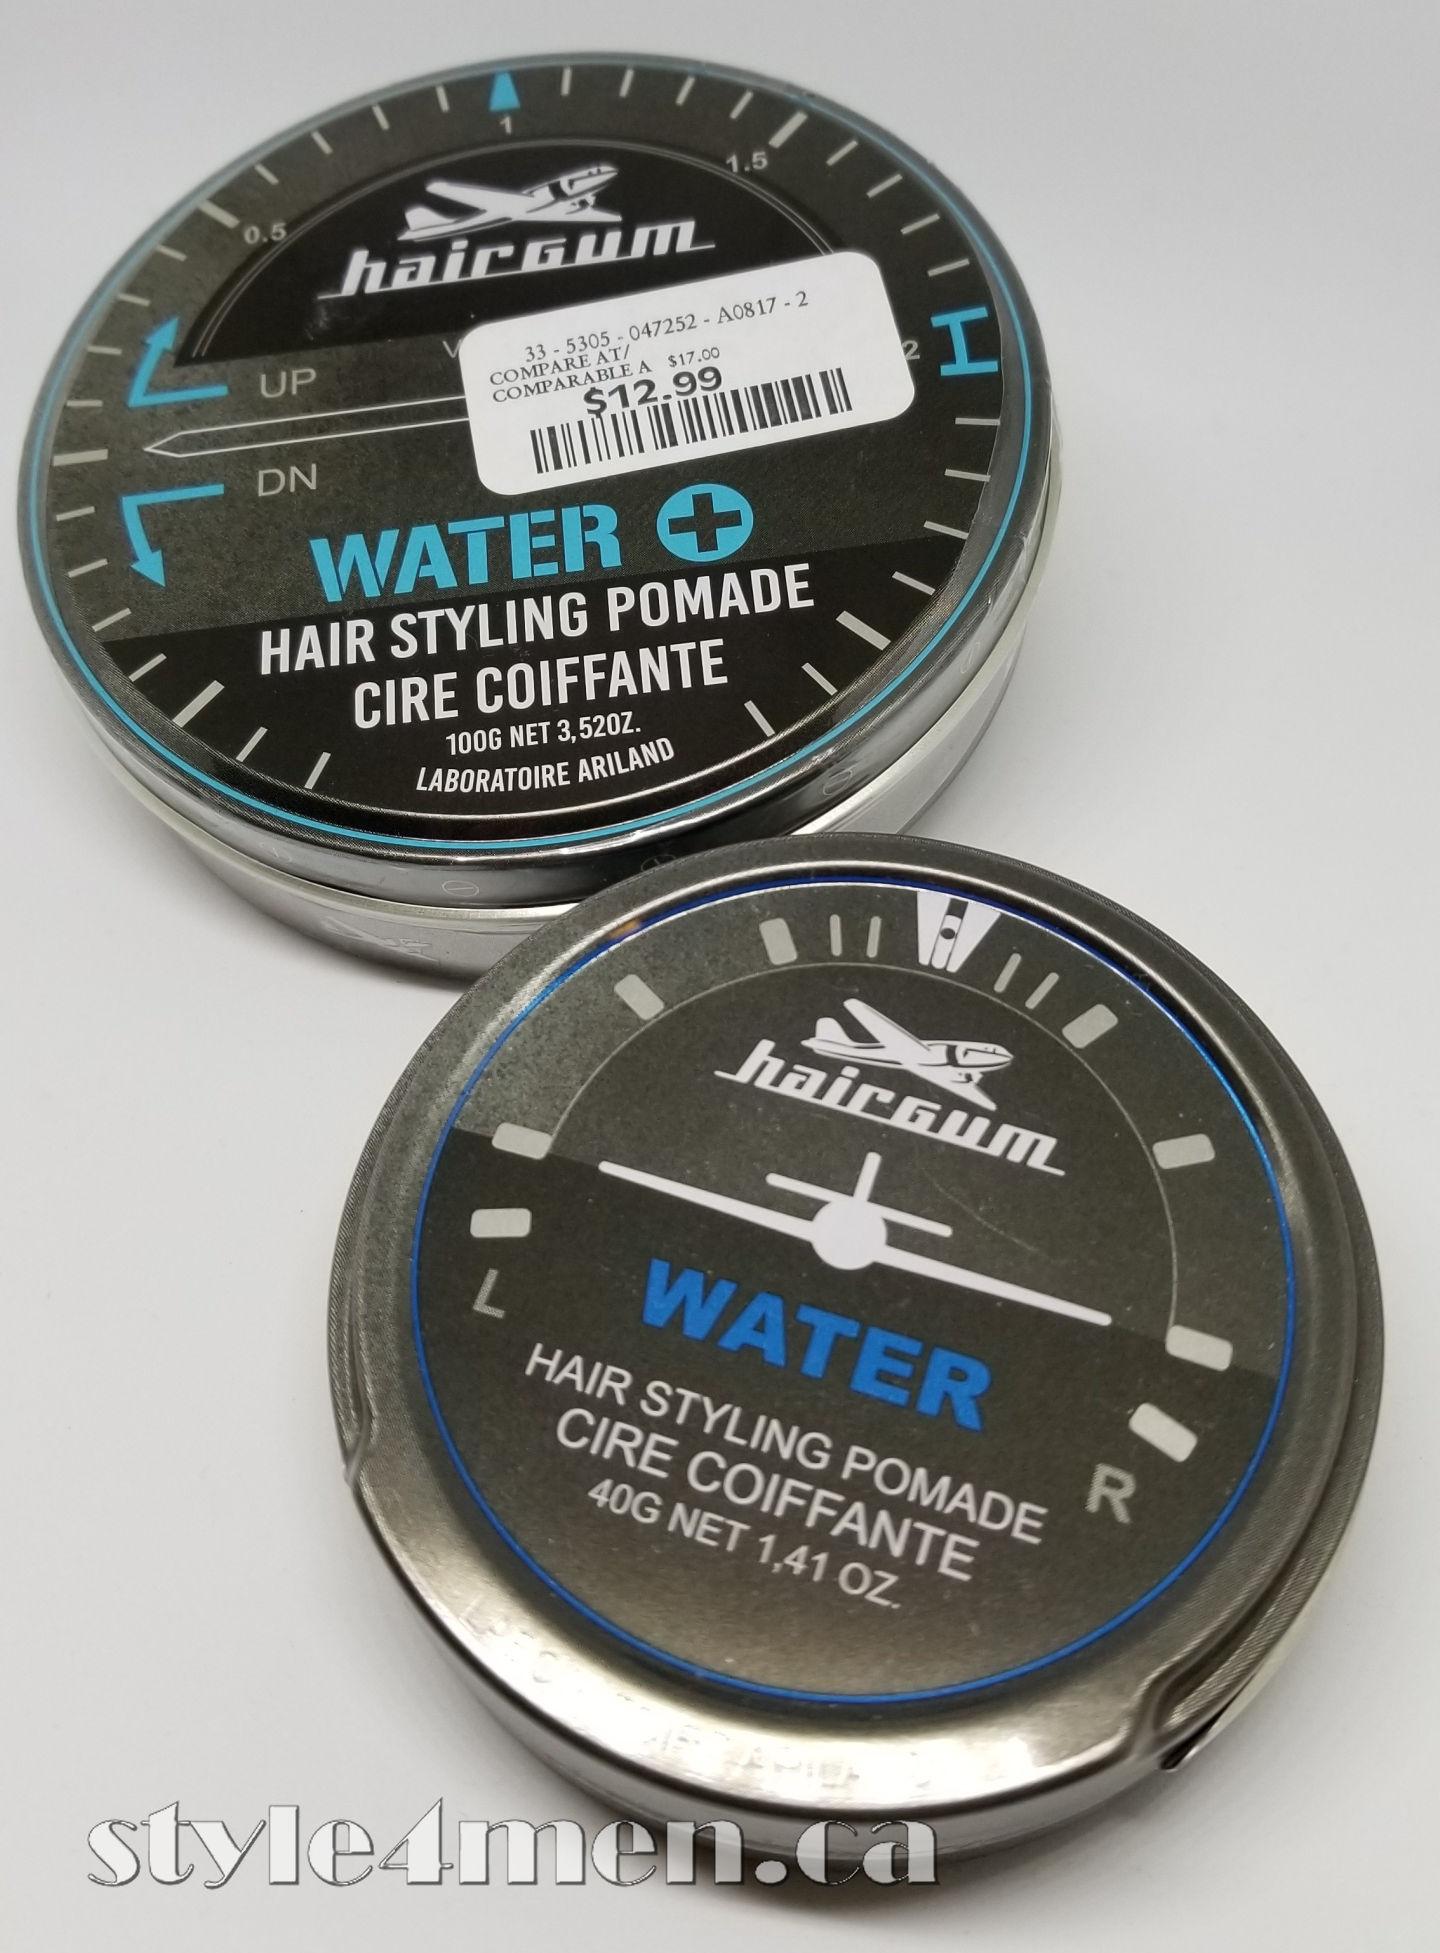 Hairgum Water